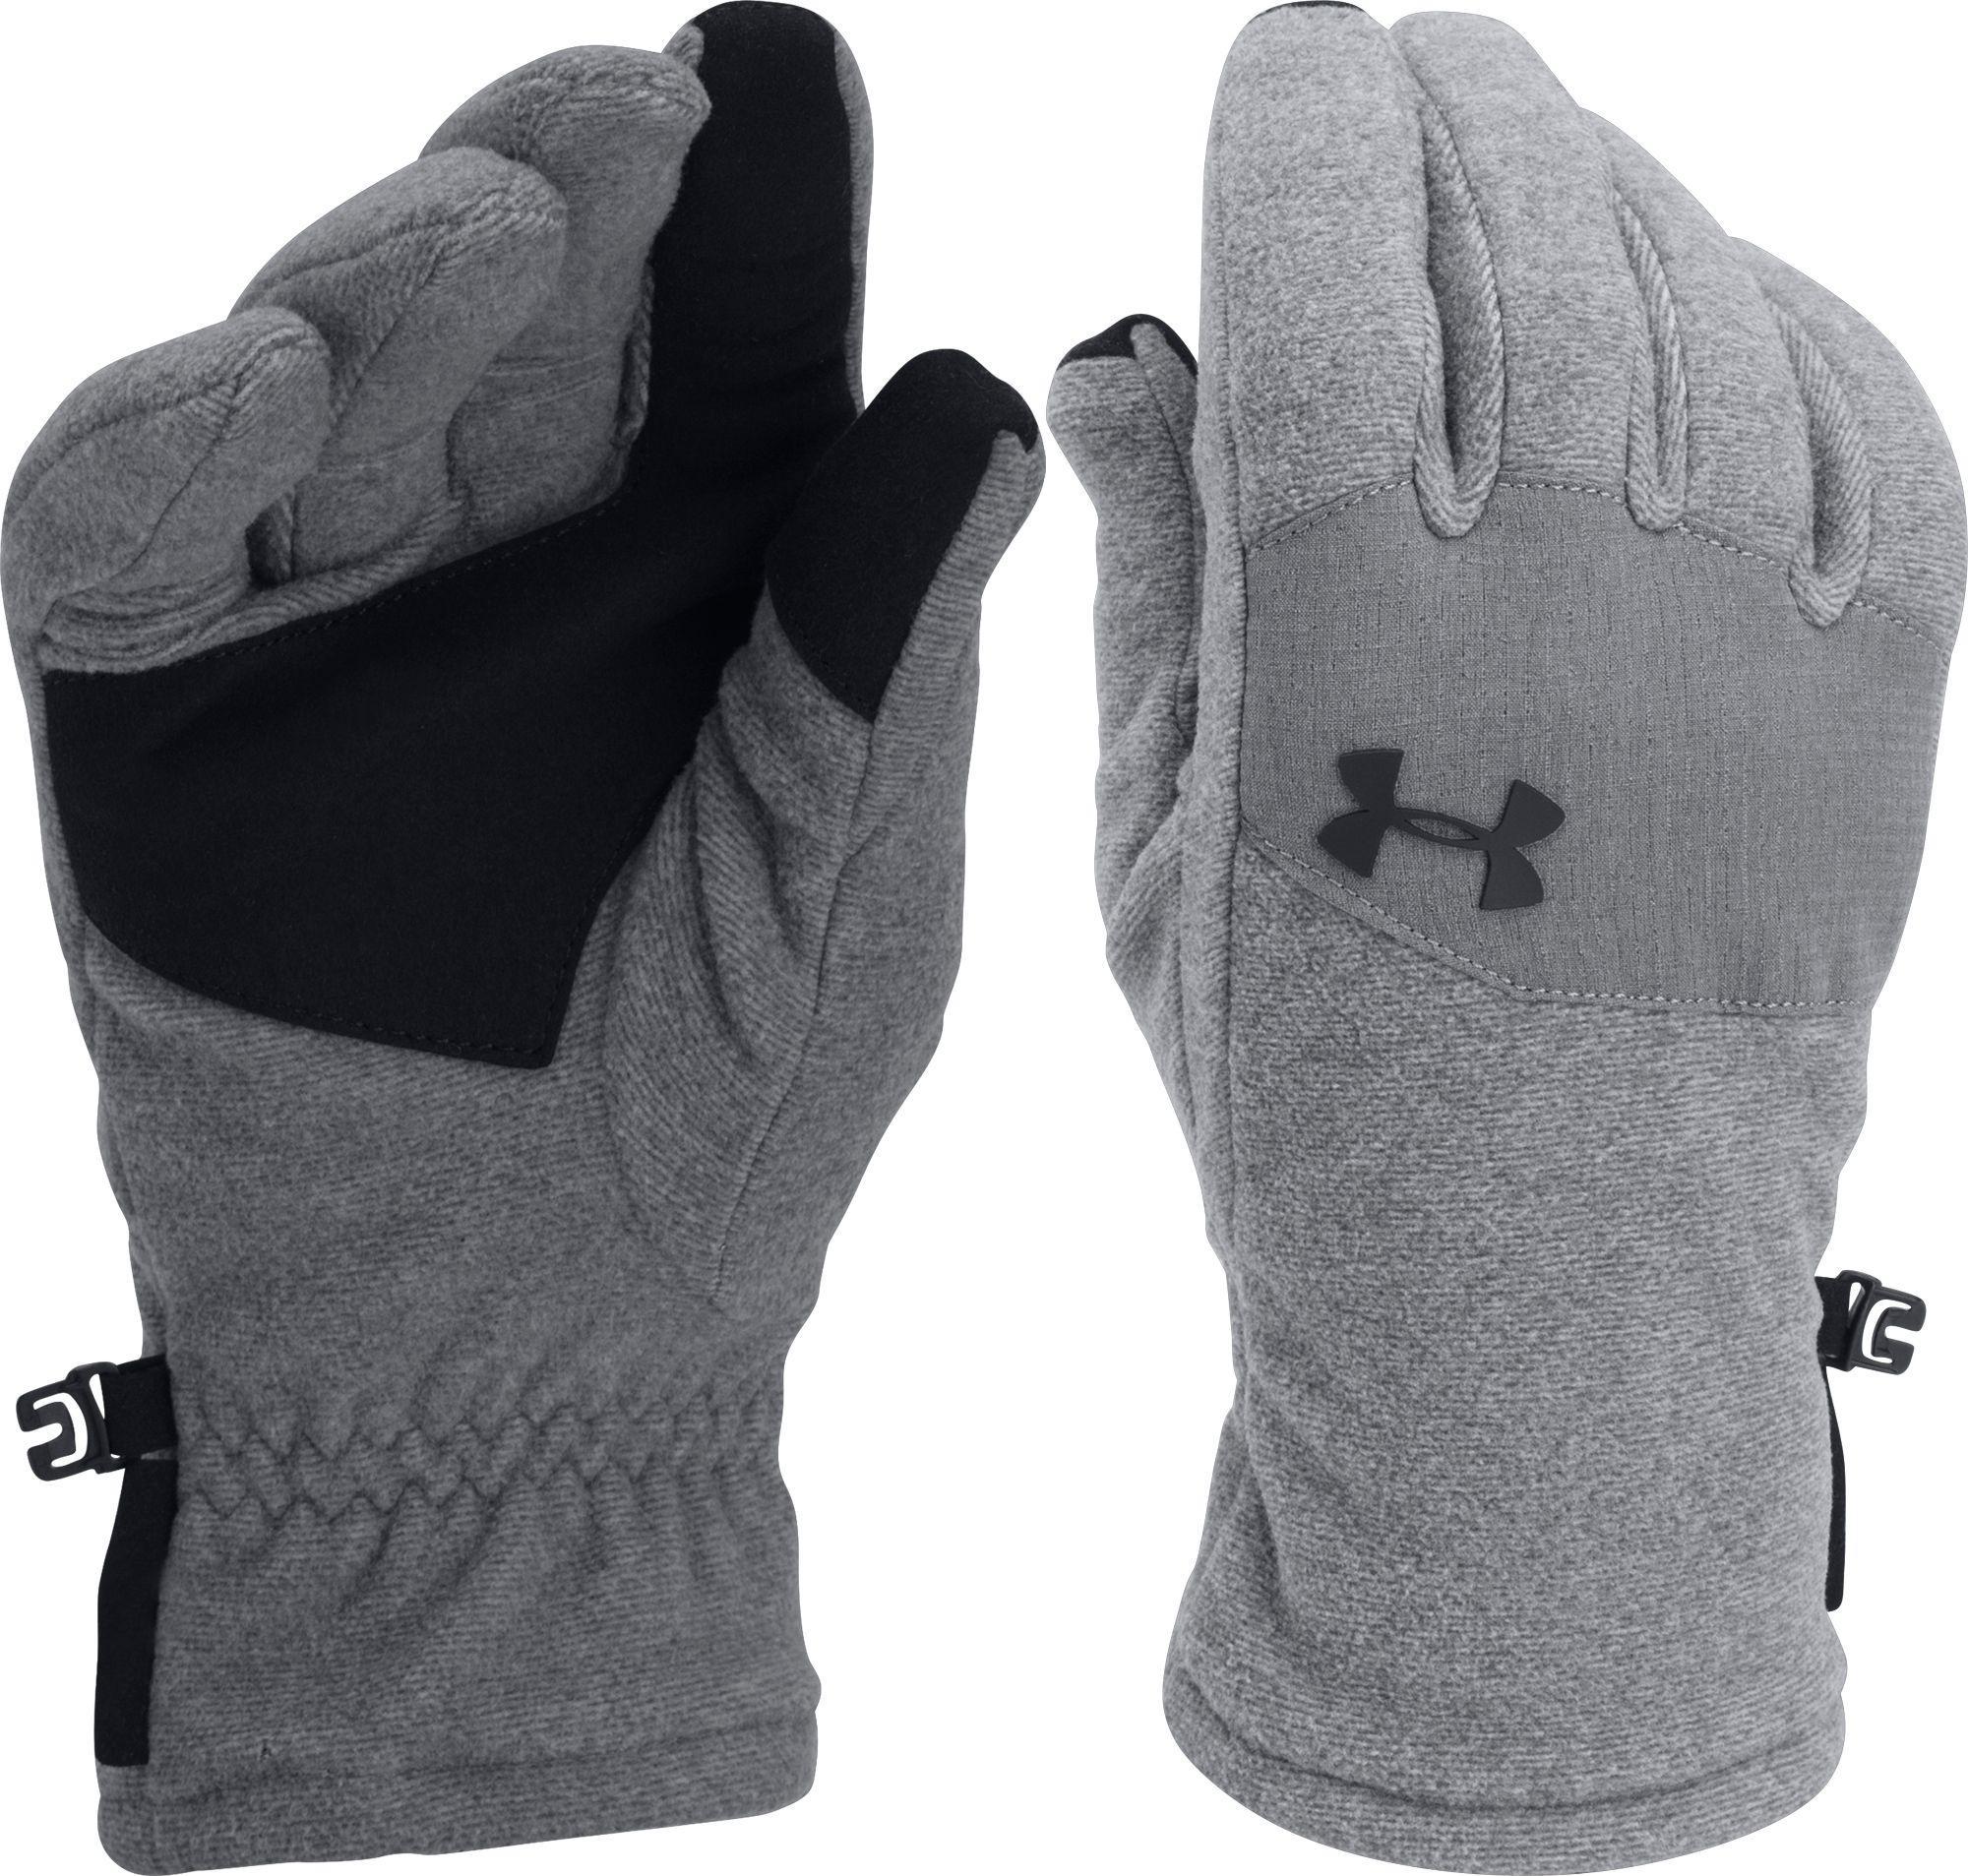 Under Armour Mens ColdGear Infrared Fleece Glove